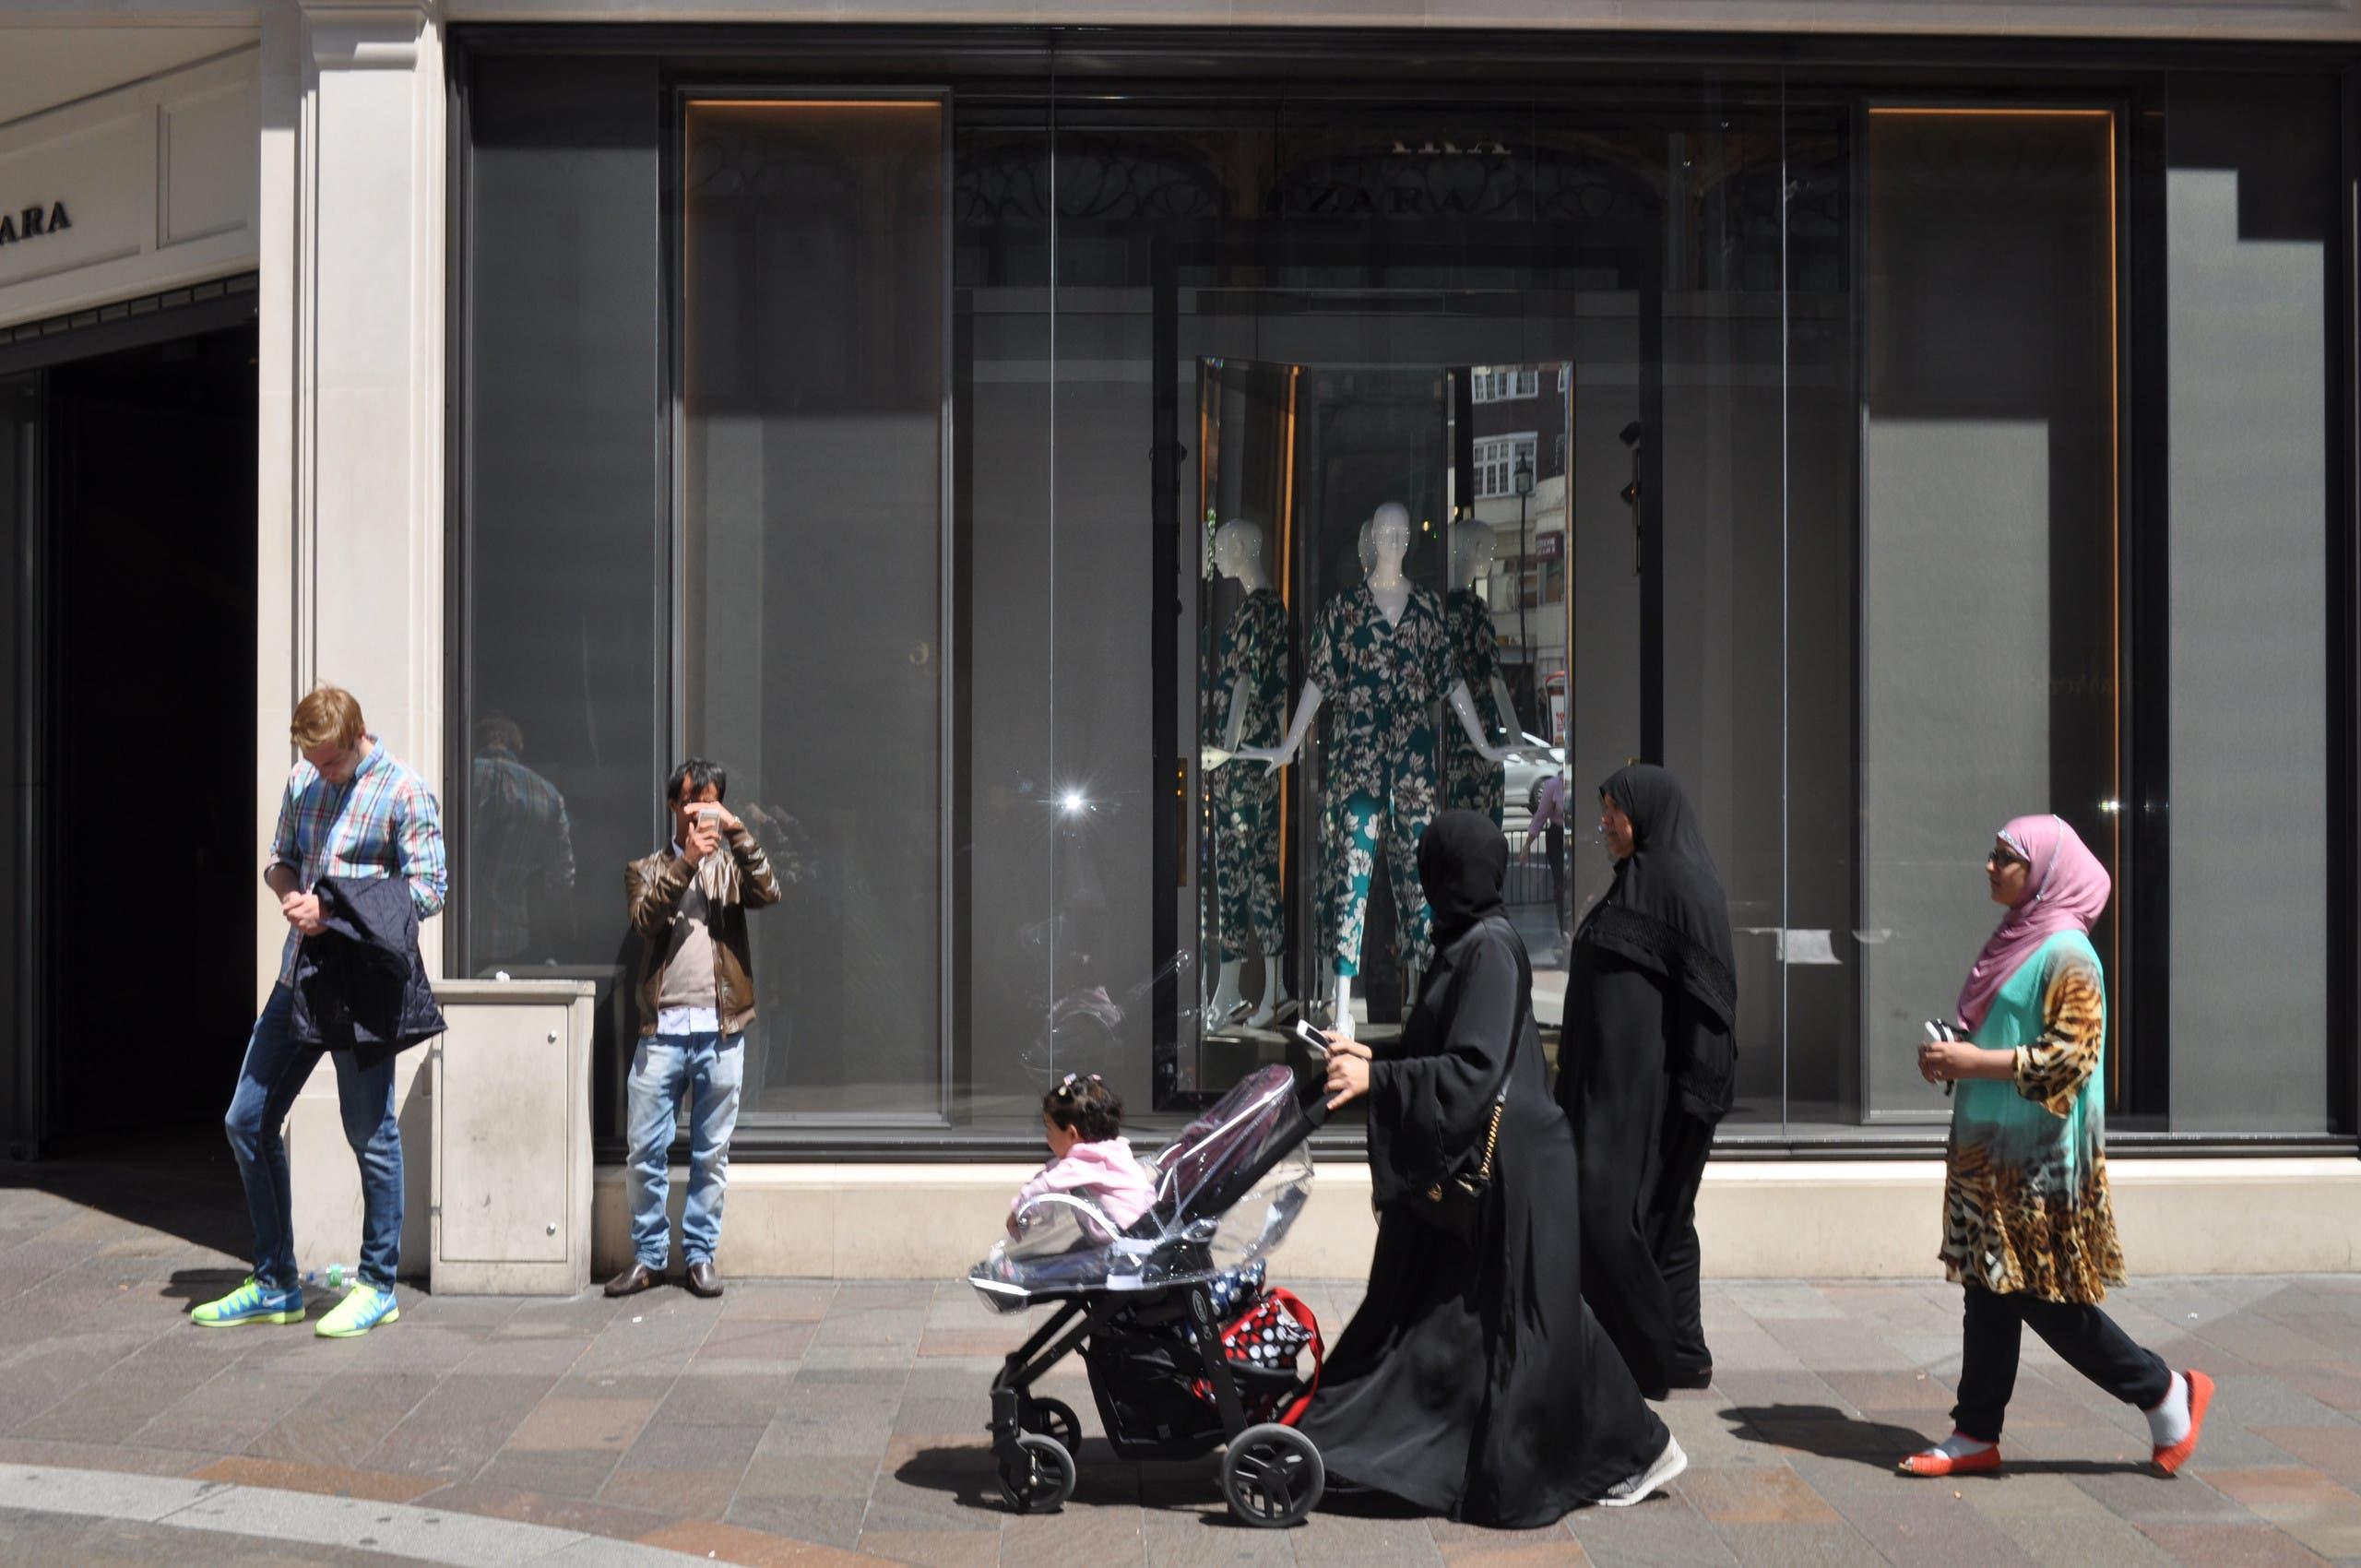 Women out shopping near Zara clothes shop in Knightsbridge, London. (Ben Flanagan, Al Arabiya English)